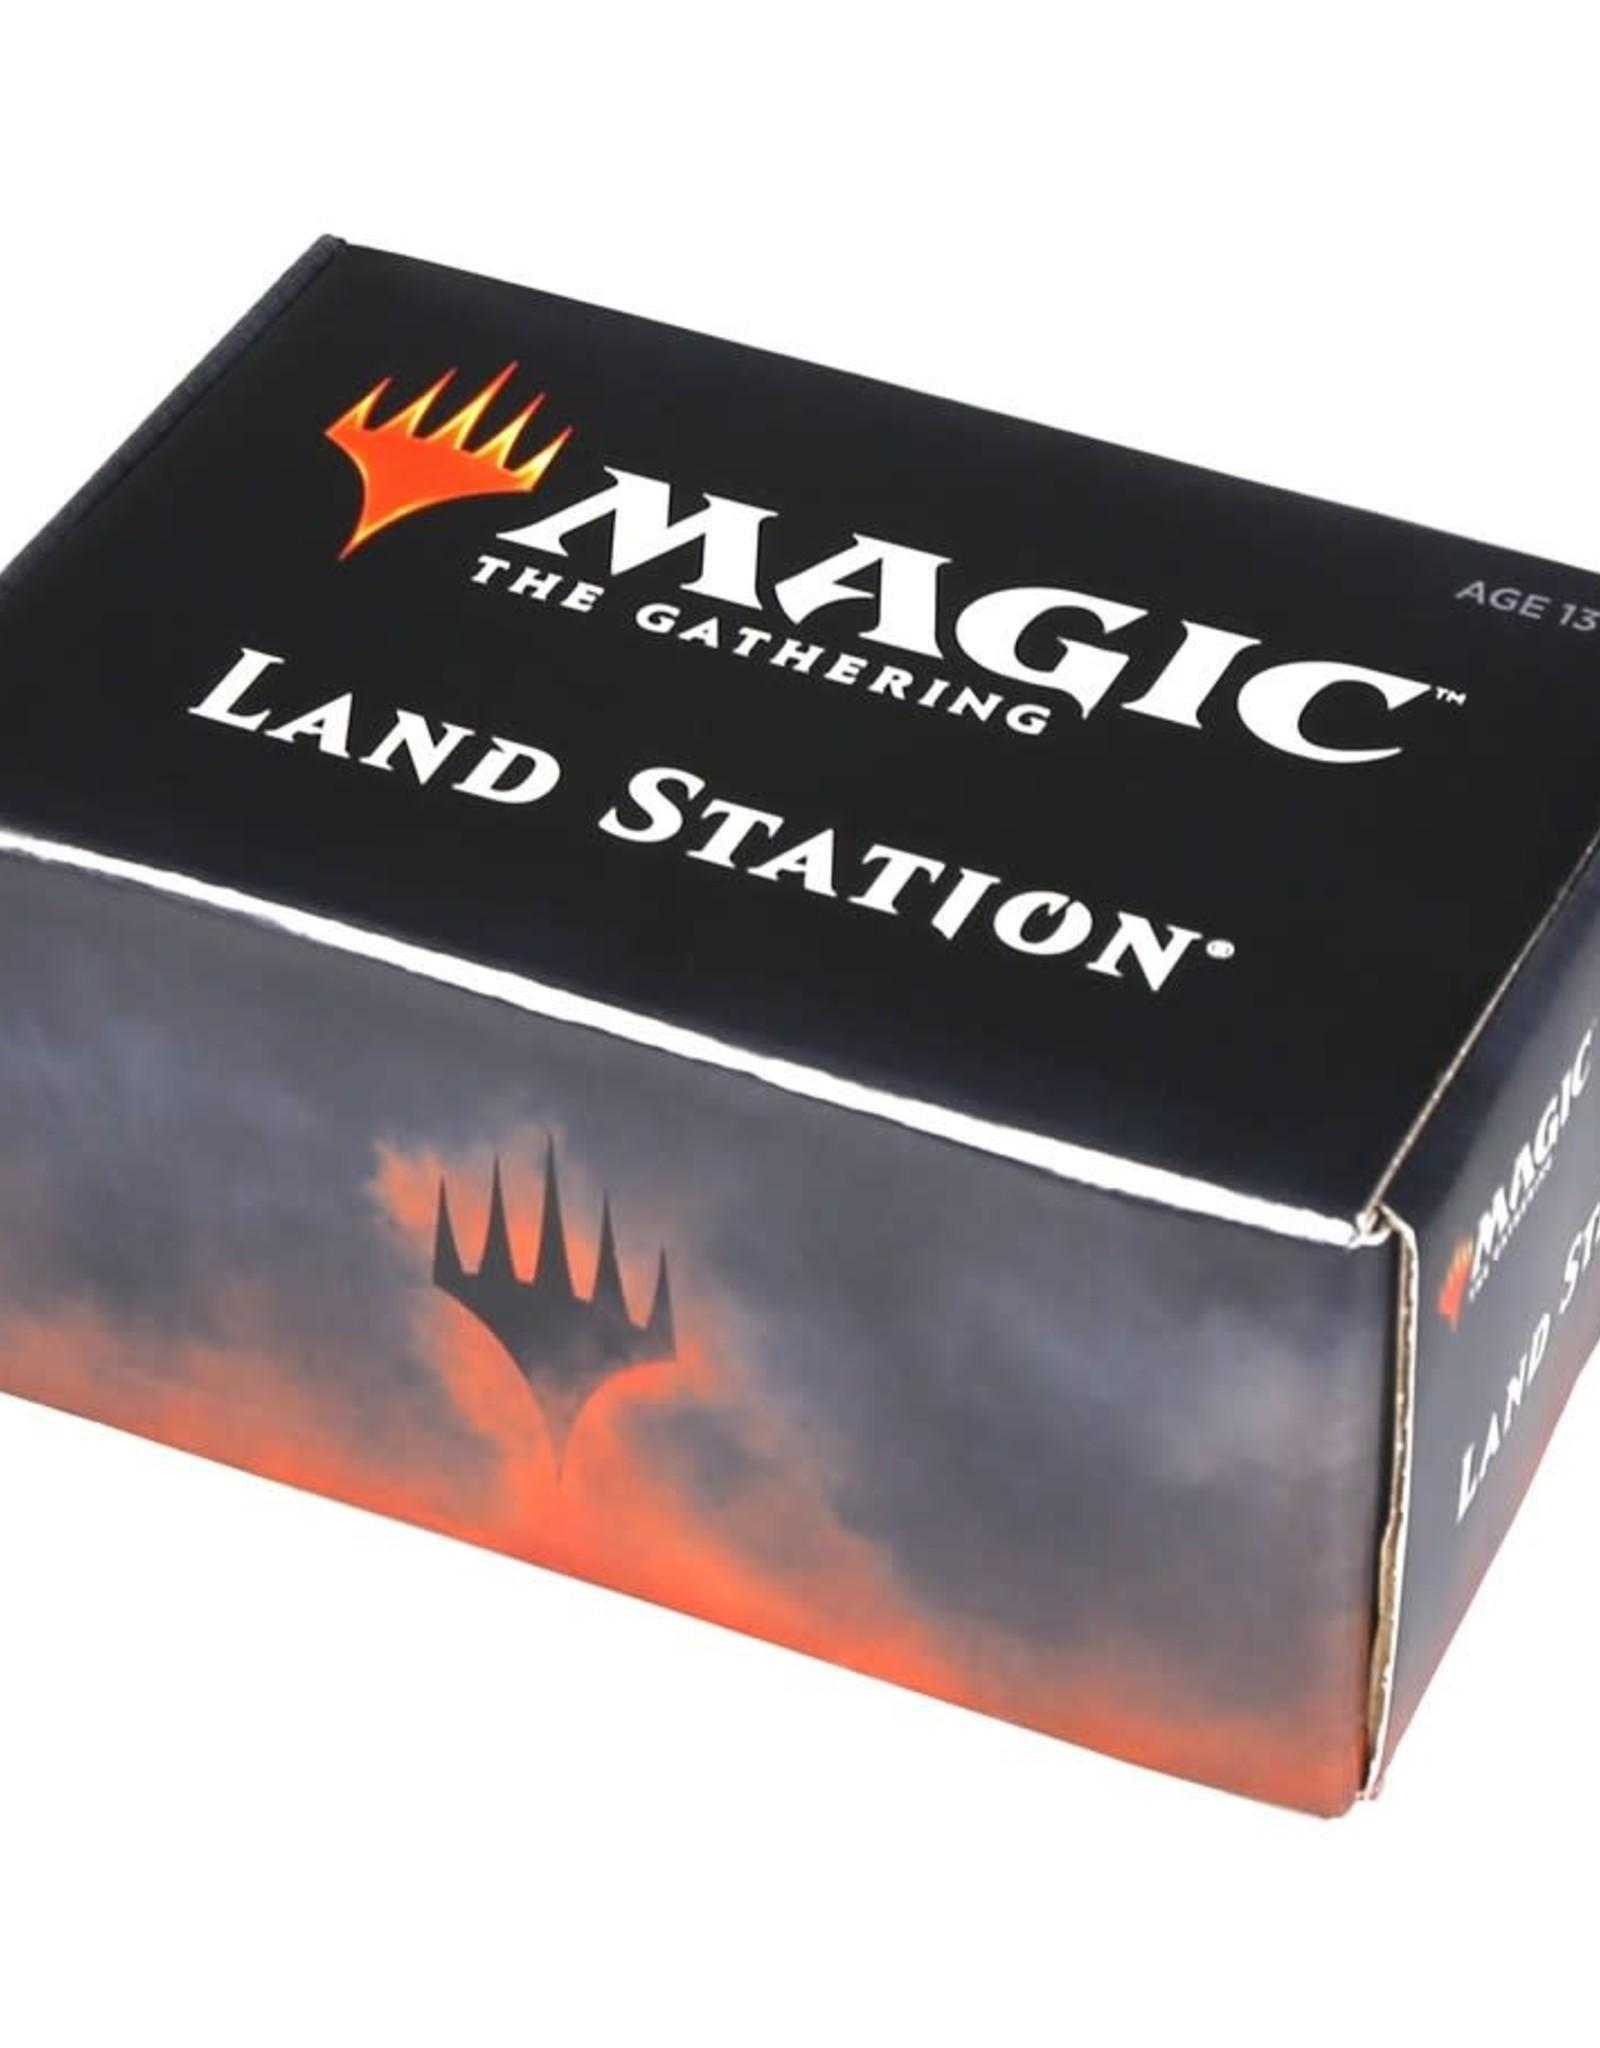 Wizards of the Coast MTG Land Station Core Set 2020